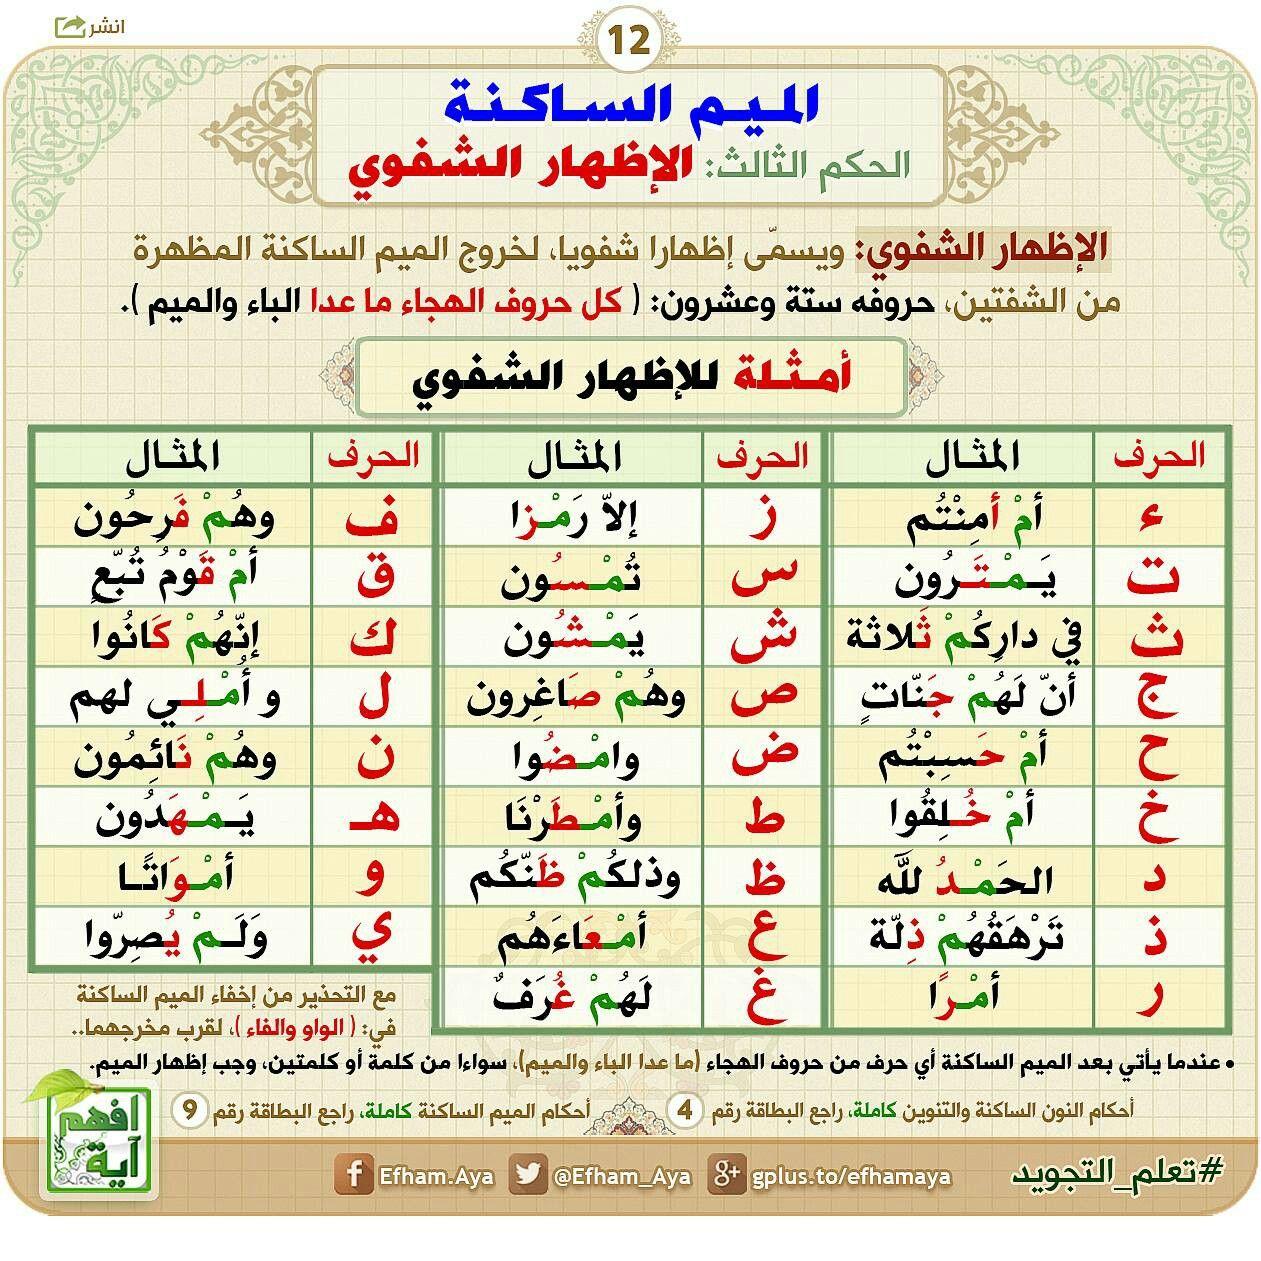 Pin By Audi On كن من الذاكرين الله Islamic Phrases Islam Facts Tajweed Quran